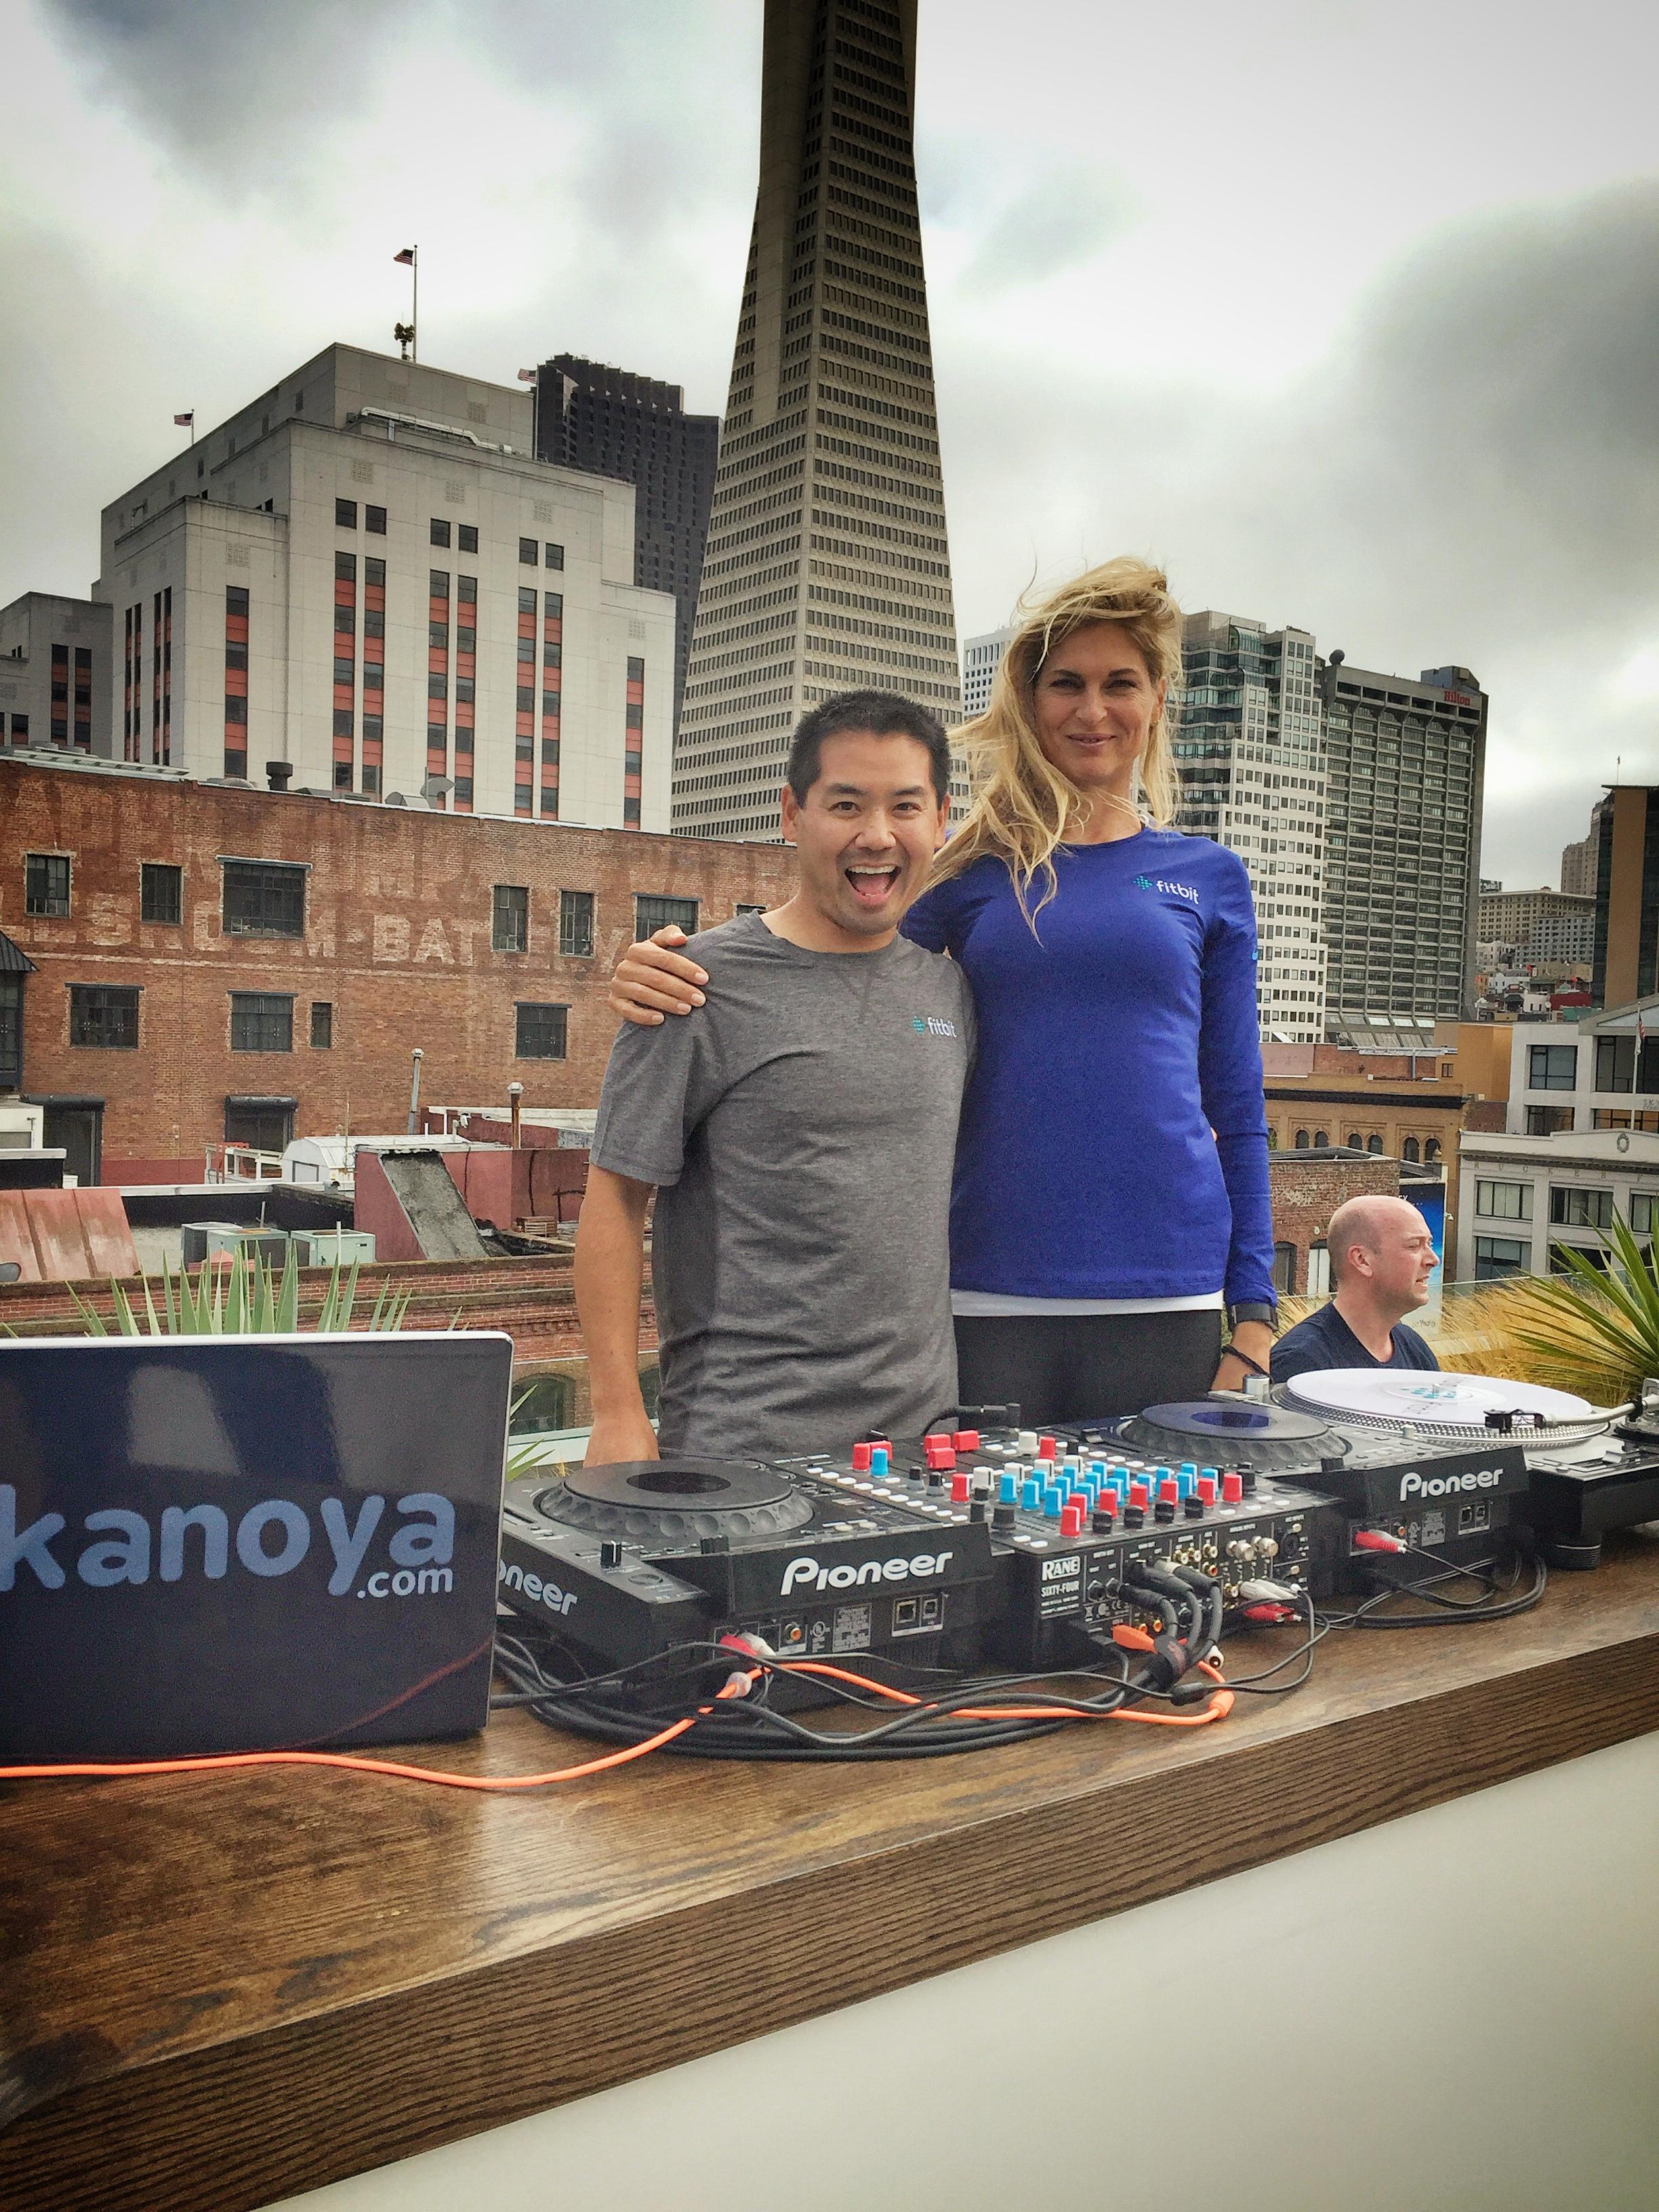 San Diego based fitness DJ, Justin Kanoya, and fitness expert Gabby Reece.